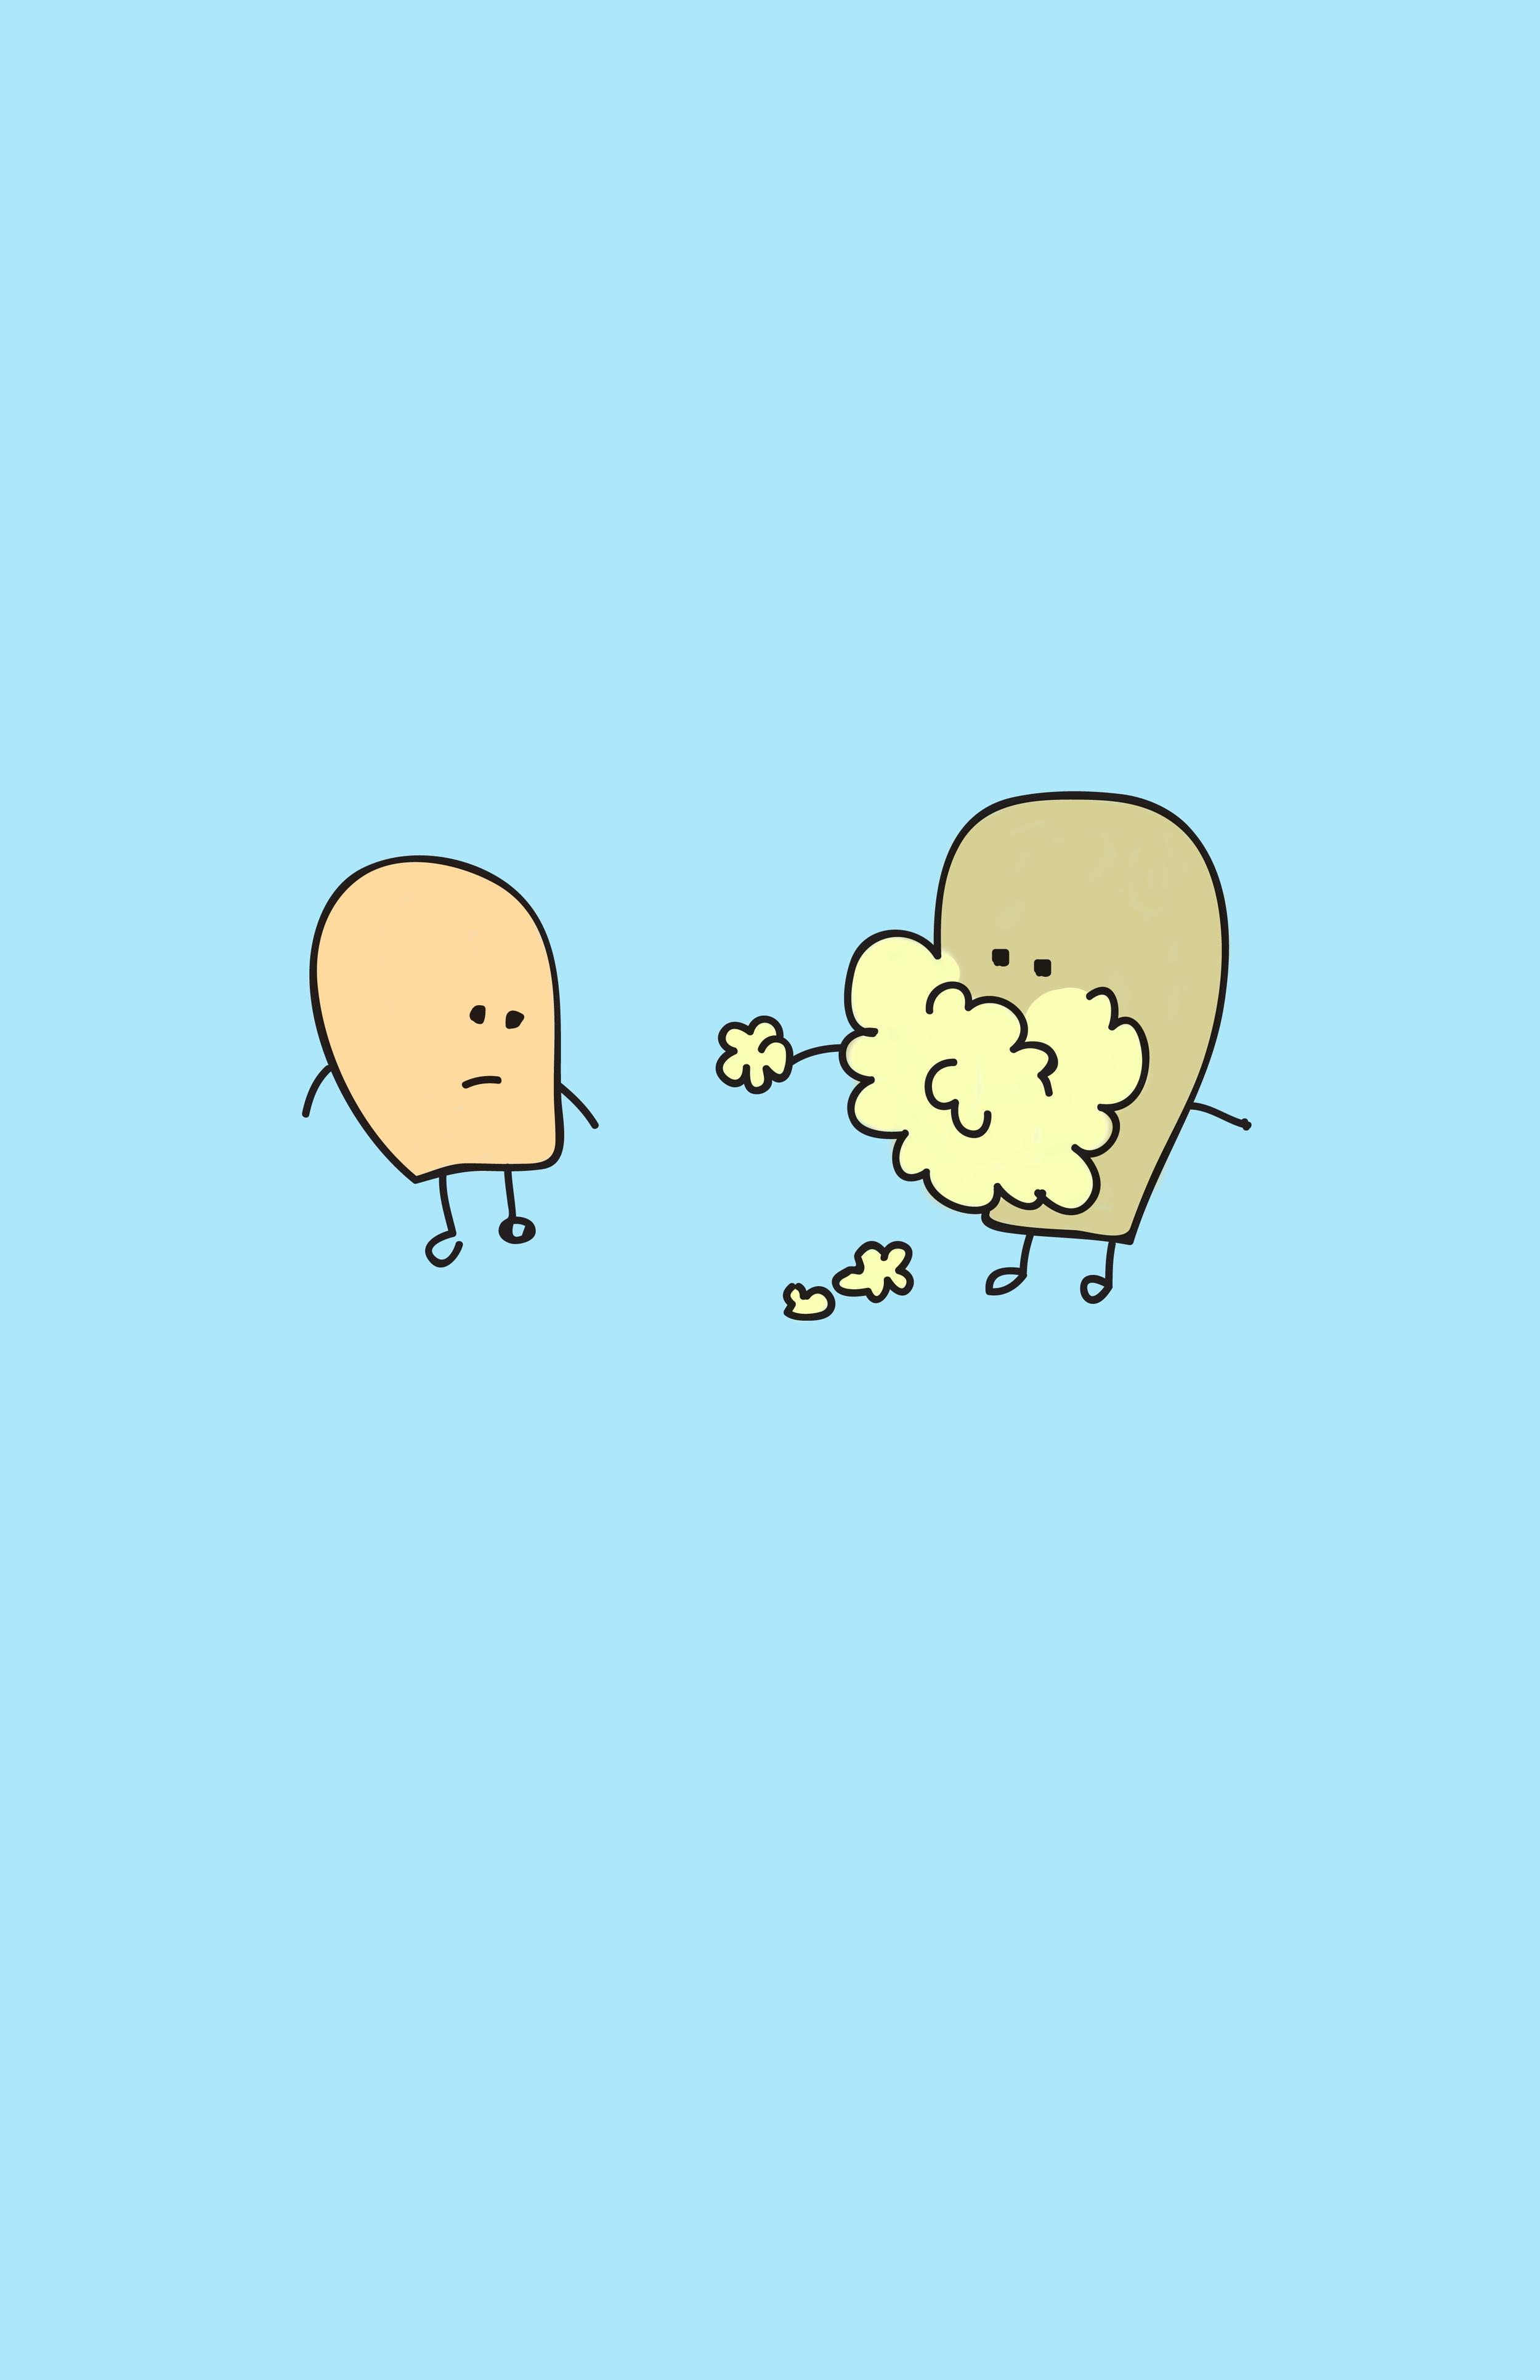 Popcorn_Characters_N3b.jpg